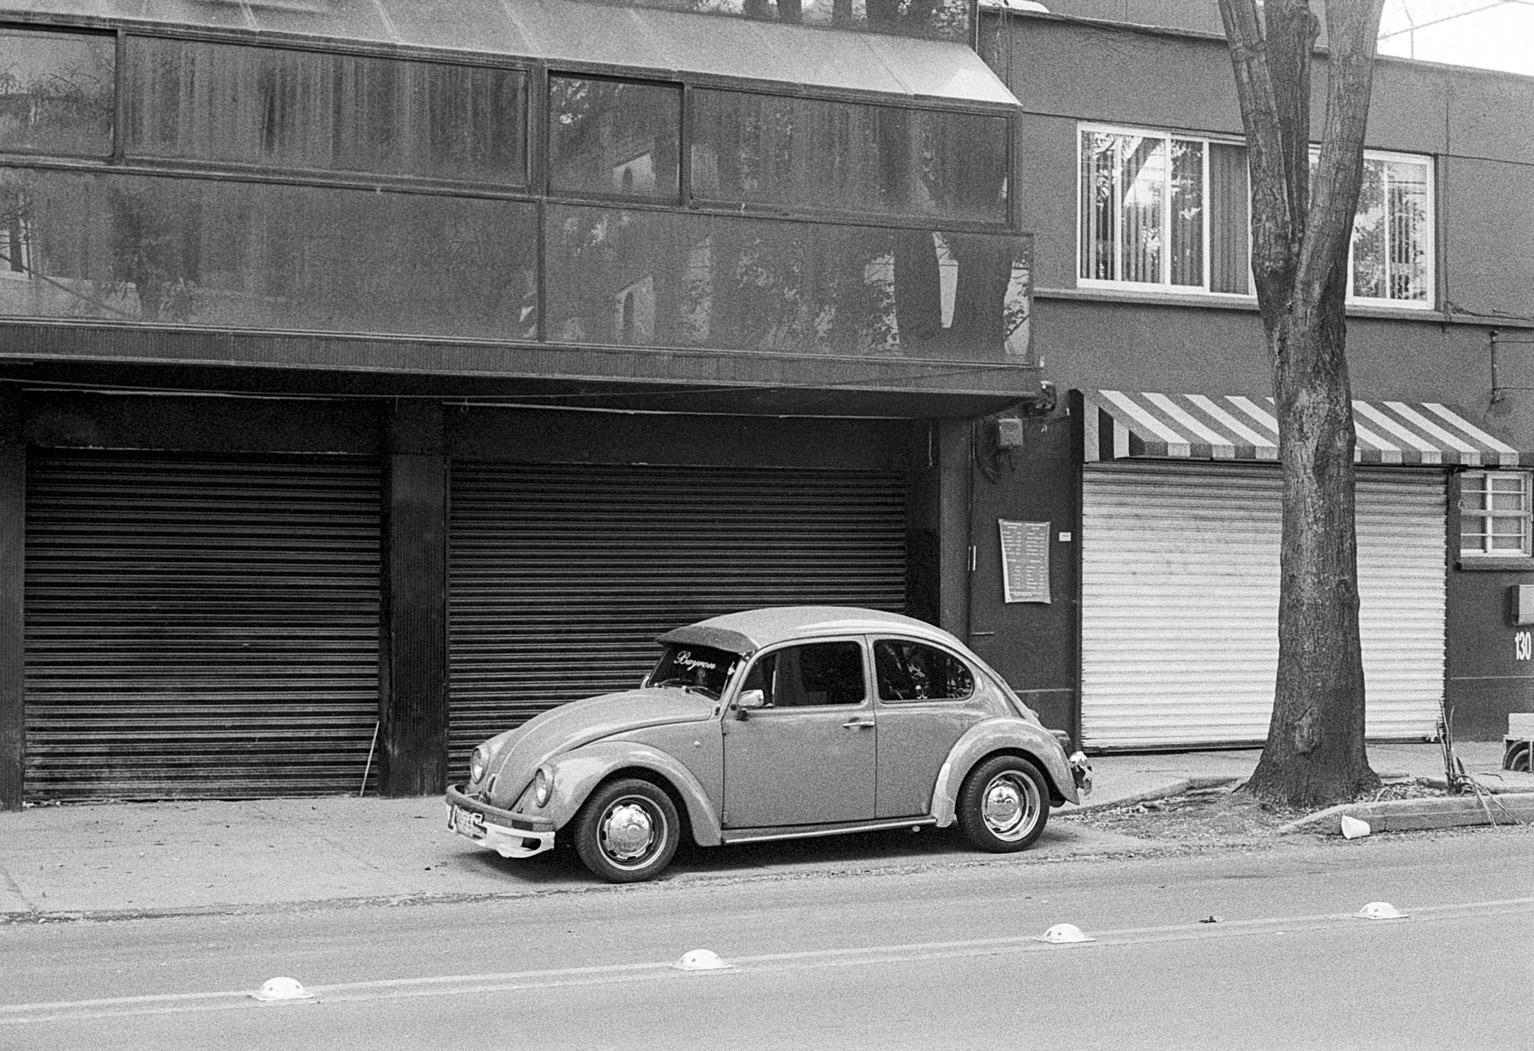 20190523_MexicoCIty_M5-KodakTrix400_023-Edit.jpg